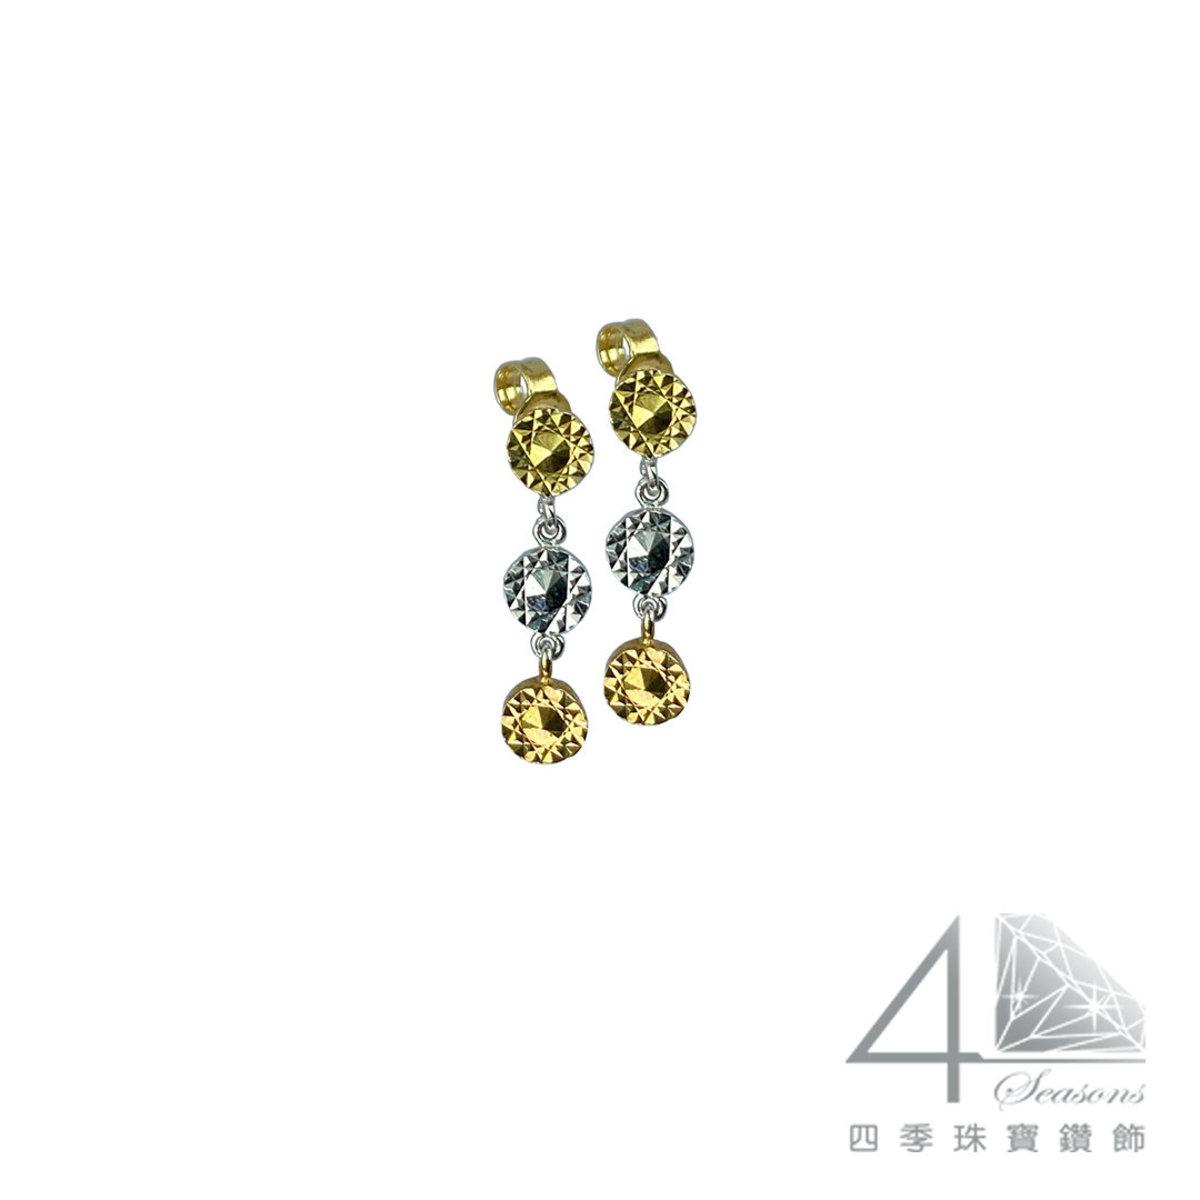 18K / 750 White Yellow Gold Earrings